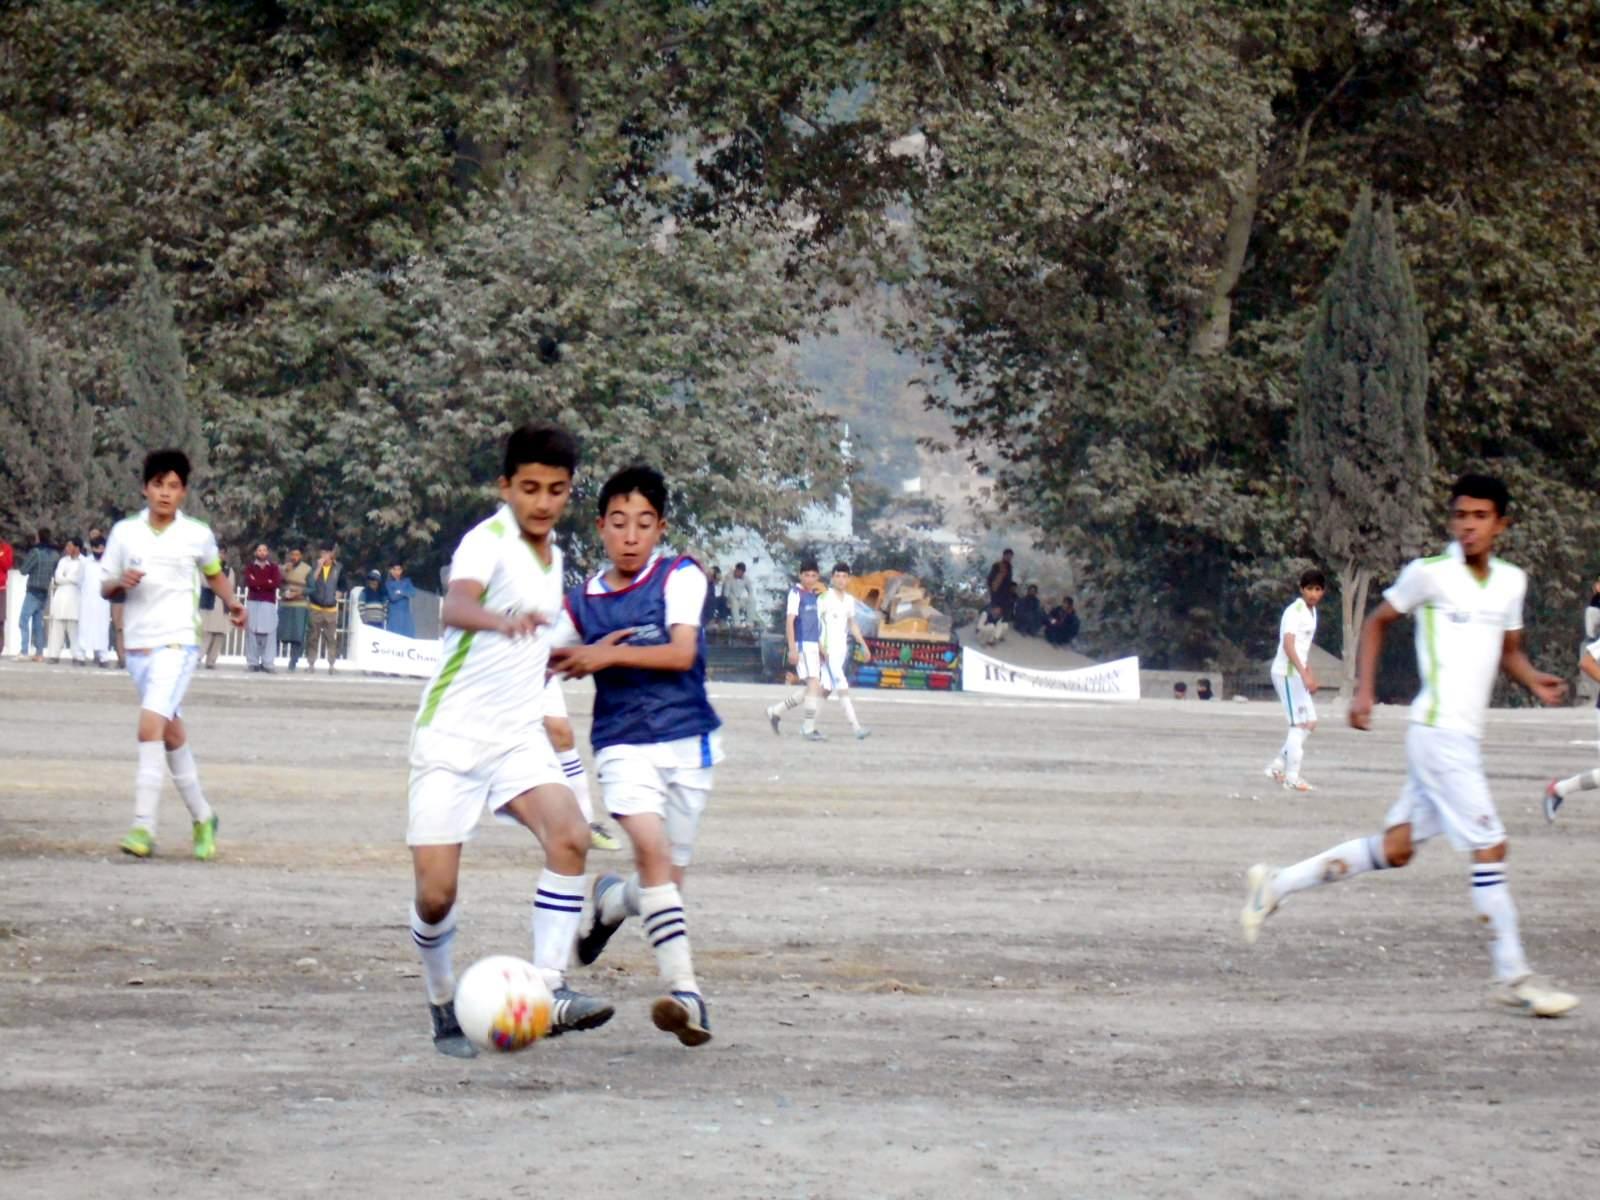 عمران خان فاؤنڈیشن انڈر 14فٹ بال ٹورنامنٹ اختتام پذیر ،چترال ٹاون کی ٹیم فاتح قرار پائی